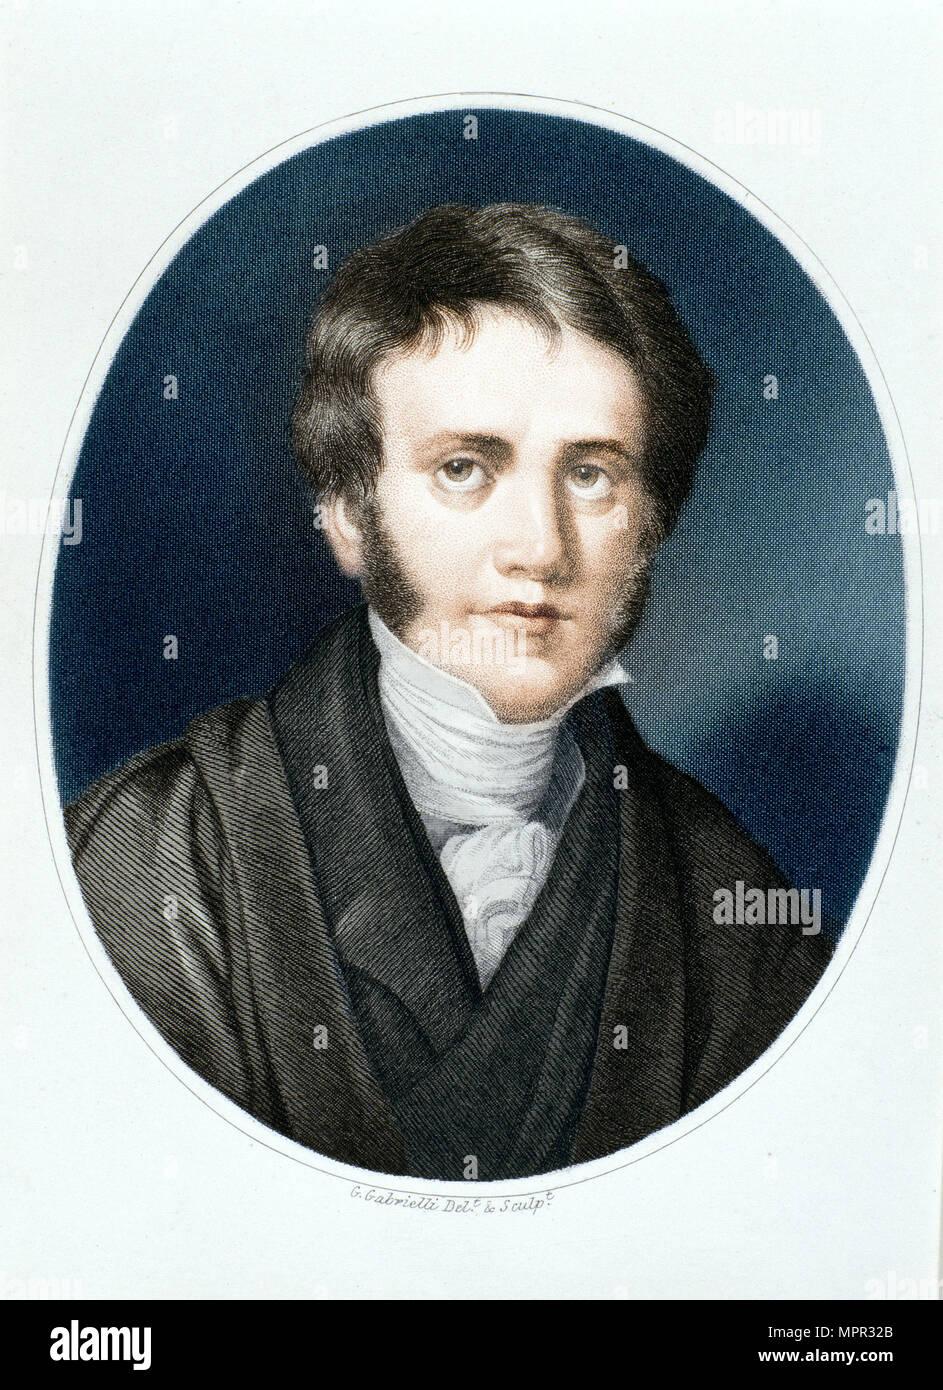 Sir John Herschel, astronomer and scientist, 1810s. Artist: Gaspare Gabrielli. - Stock Image